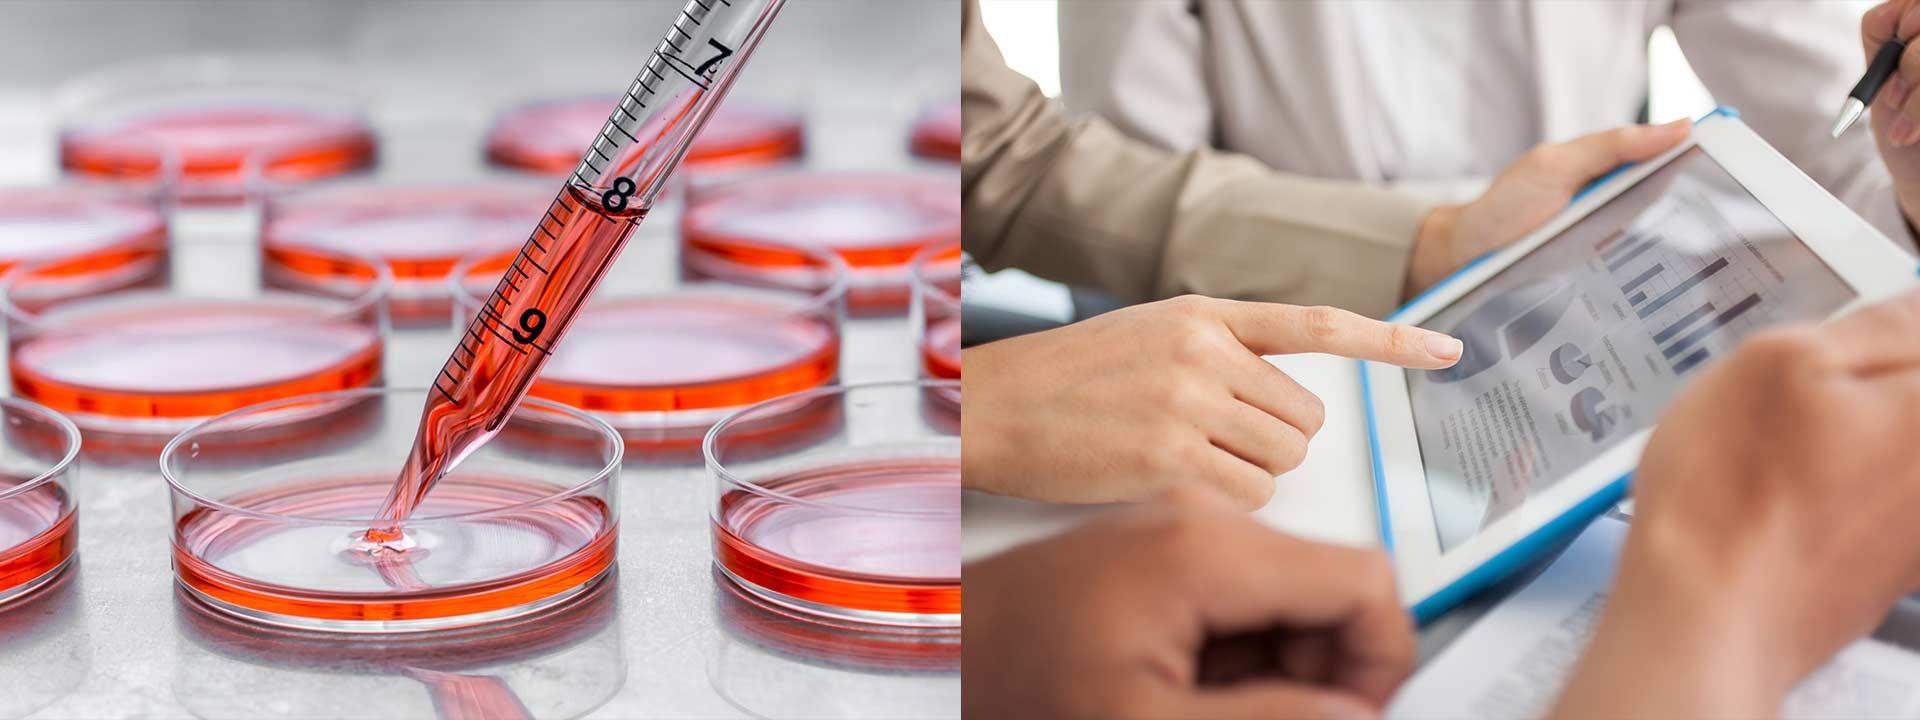 nanobiose-preclinical-services